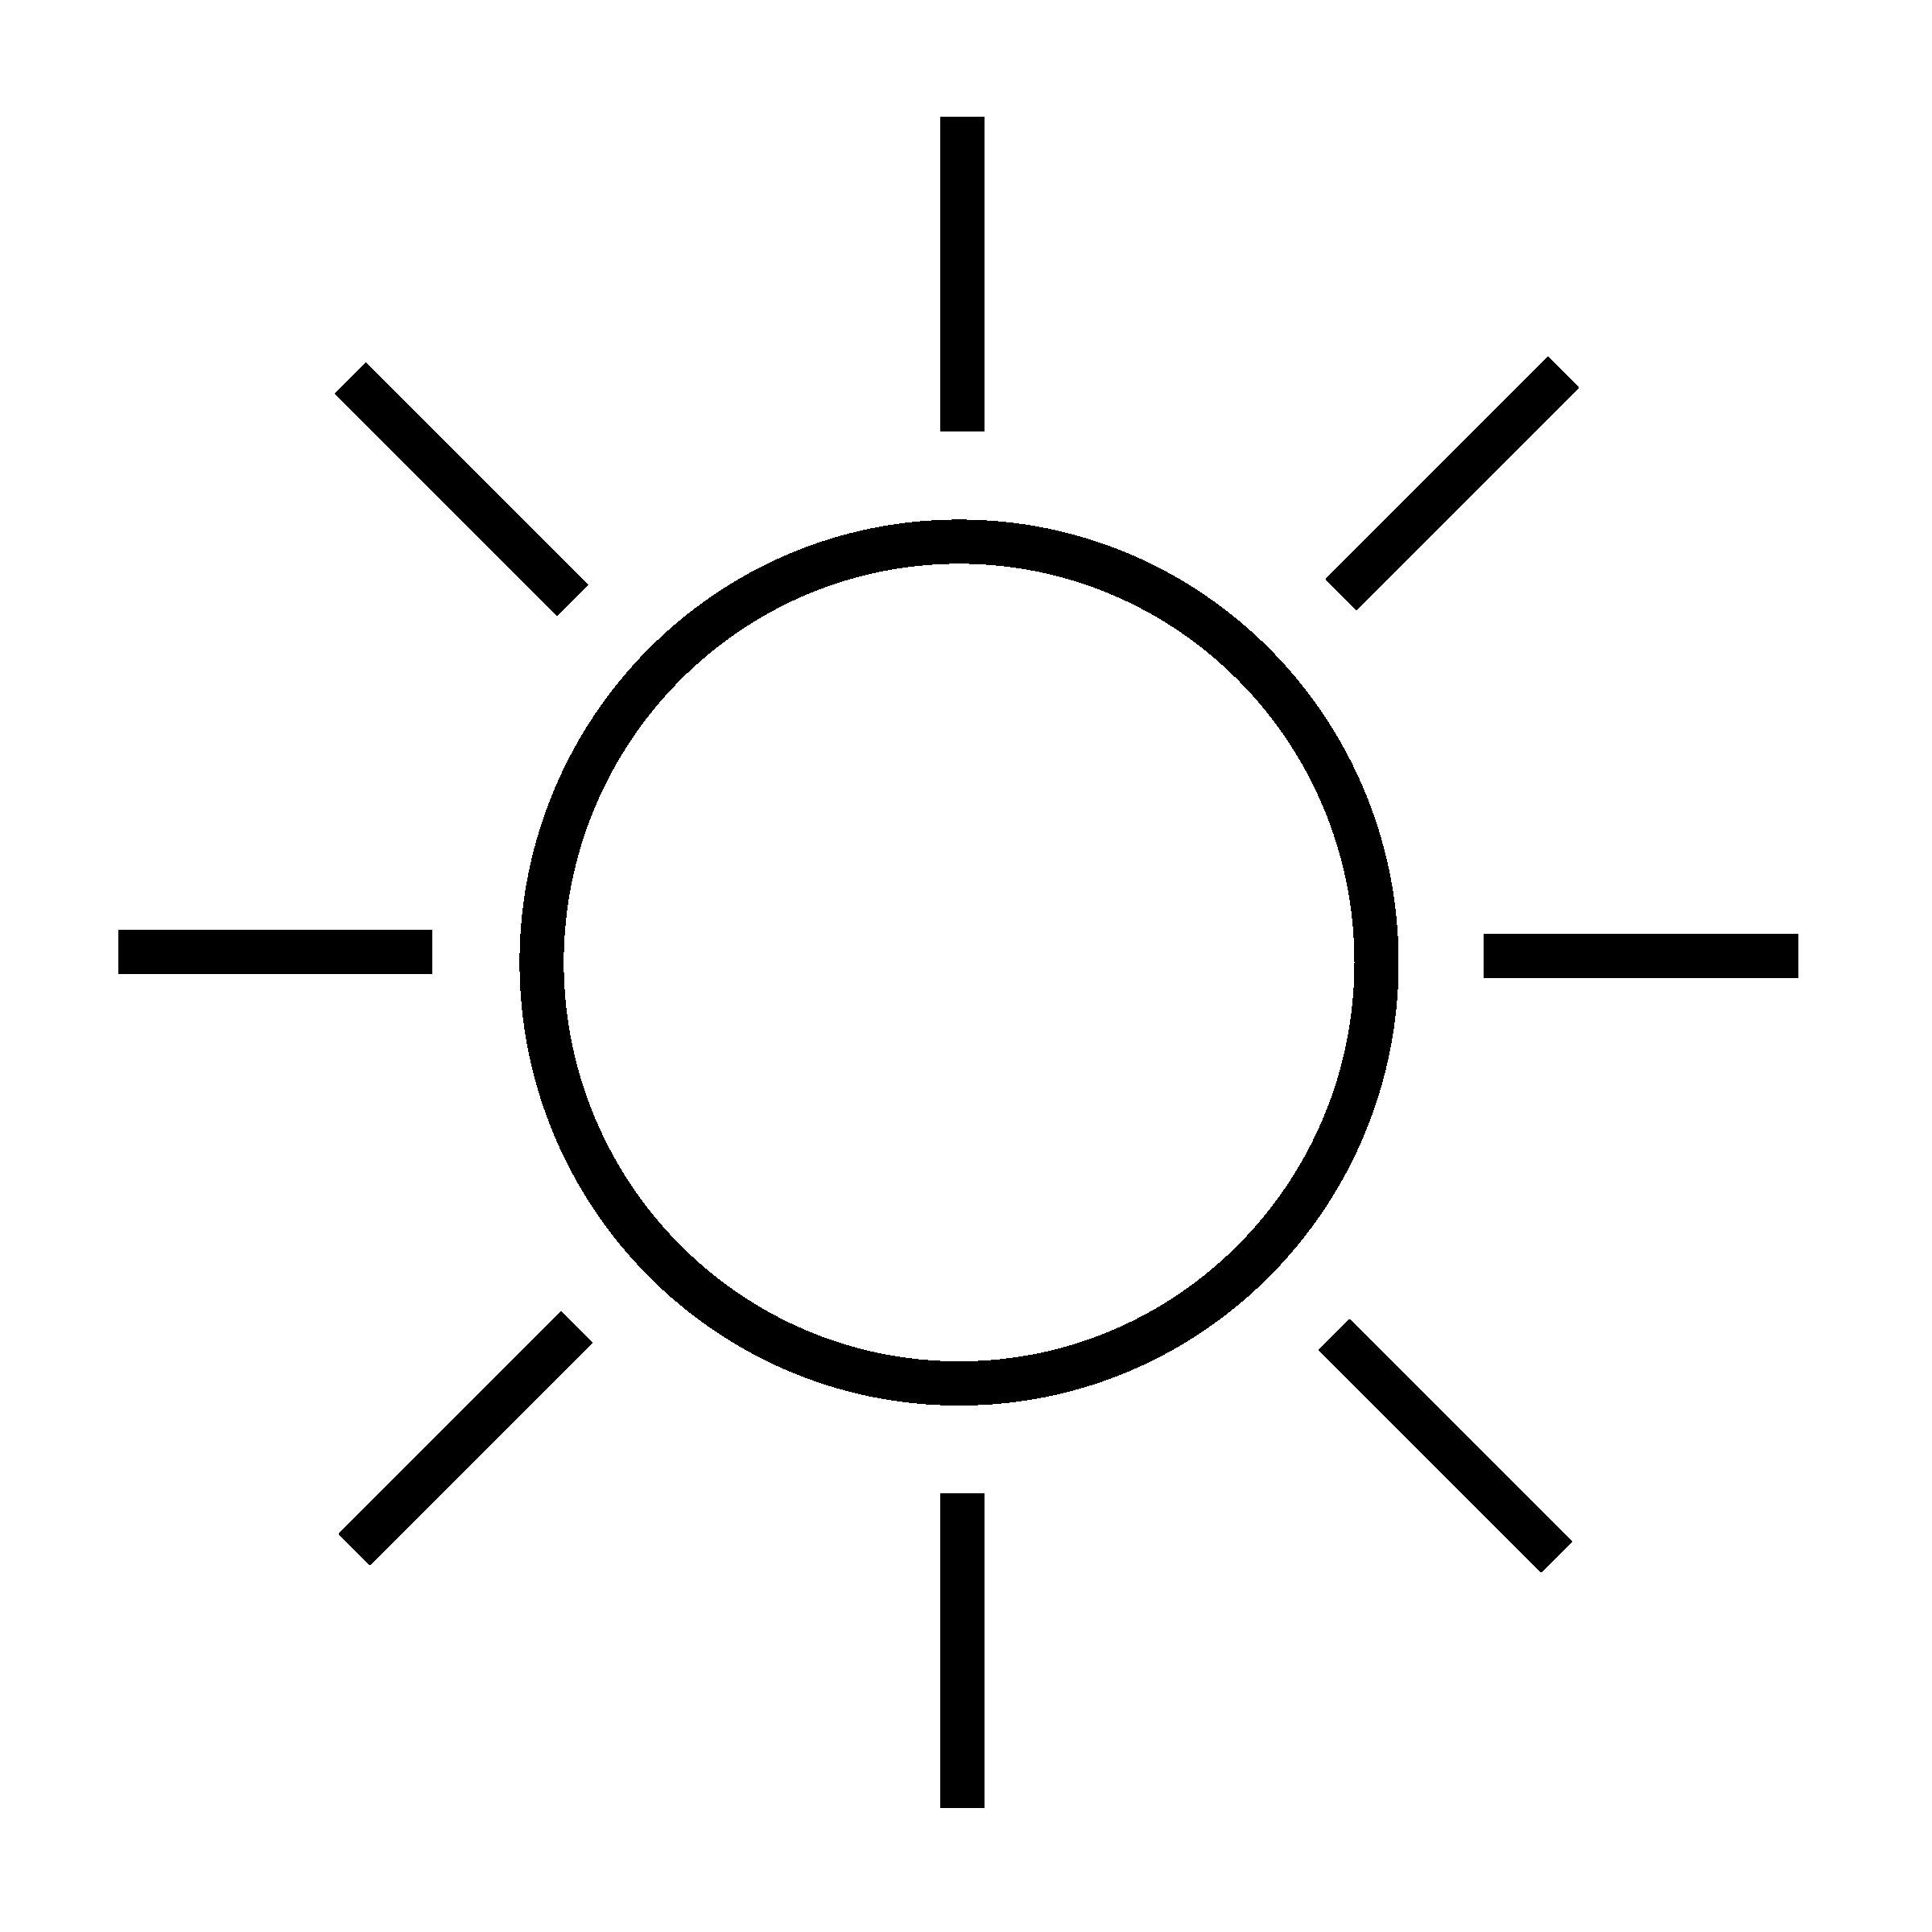 Sun Clipart Black And White.